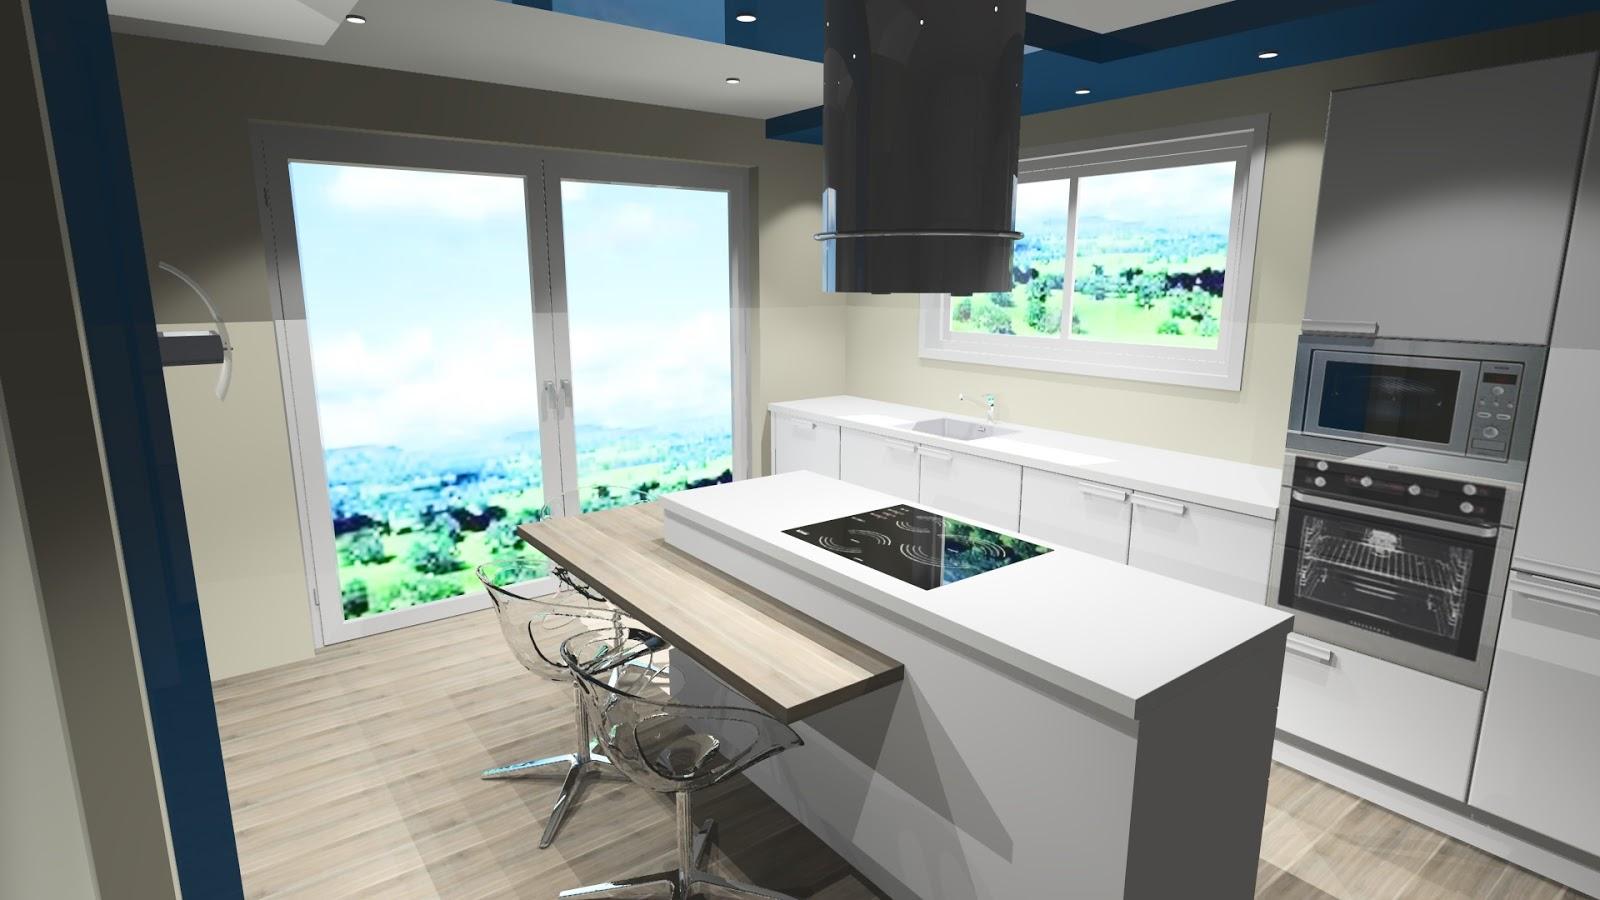 cuisine destructur e. Black Bedroom Furniture Sets. Home Design Ideas